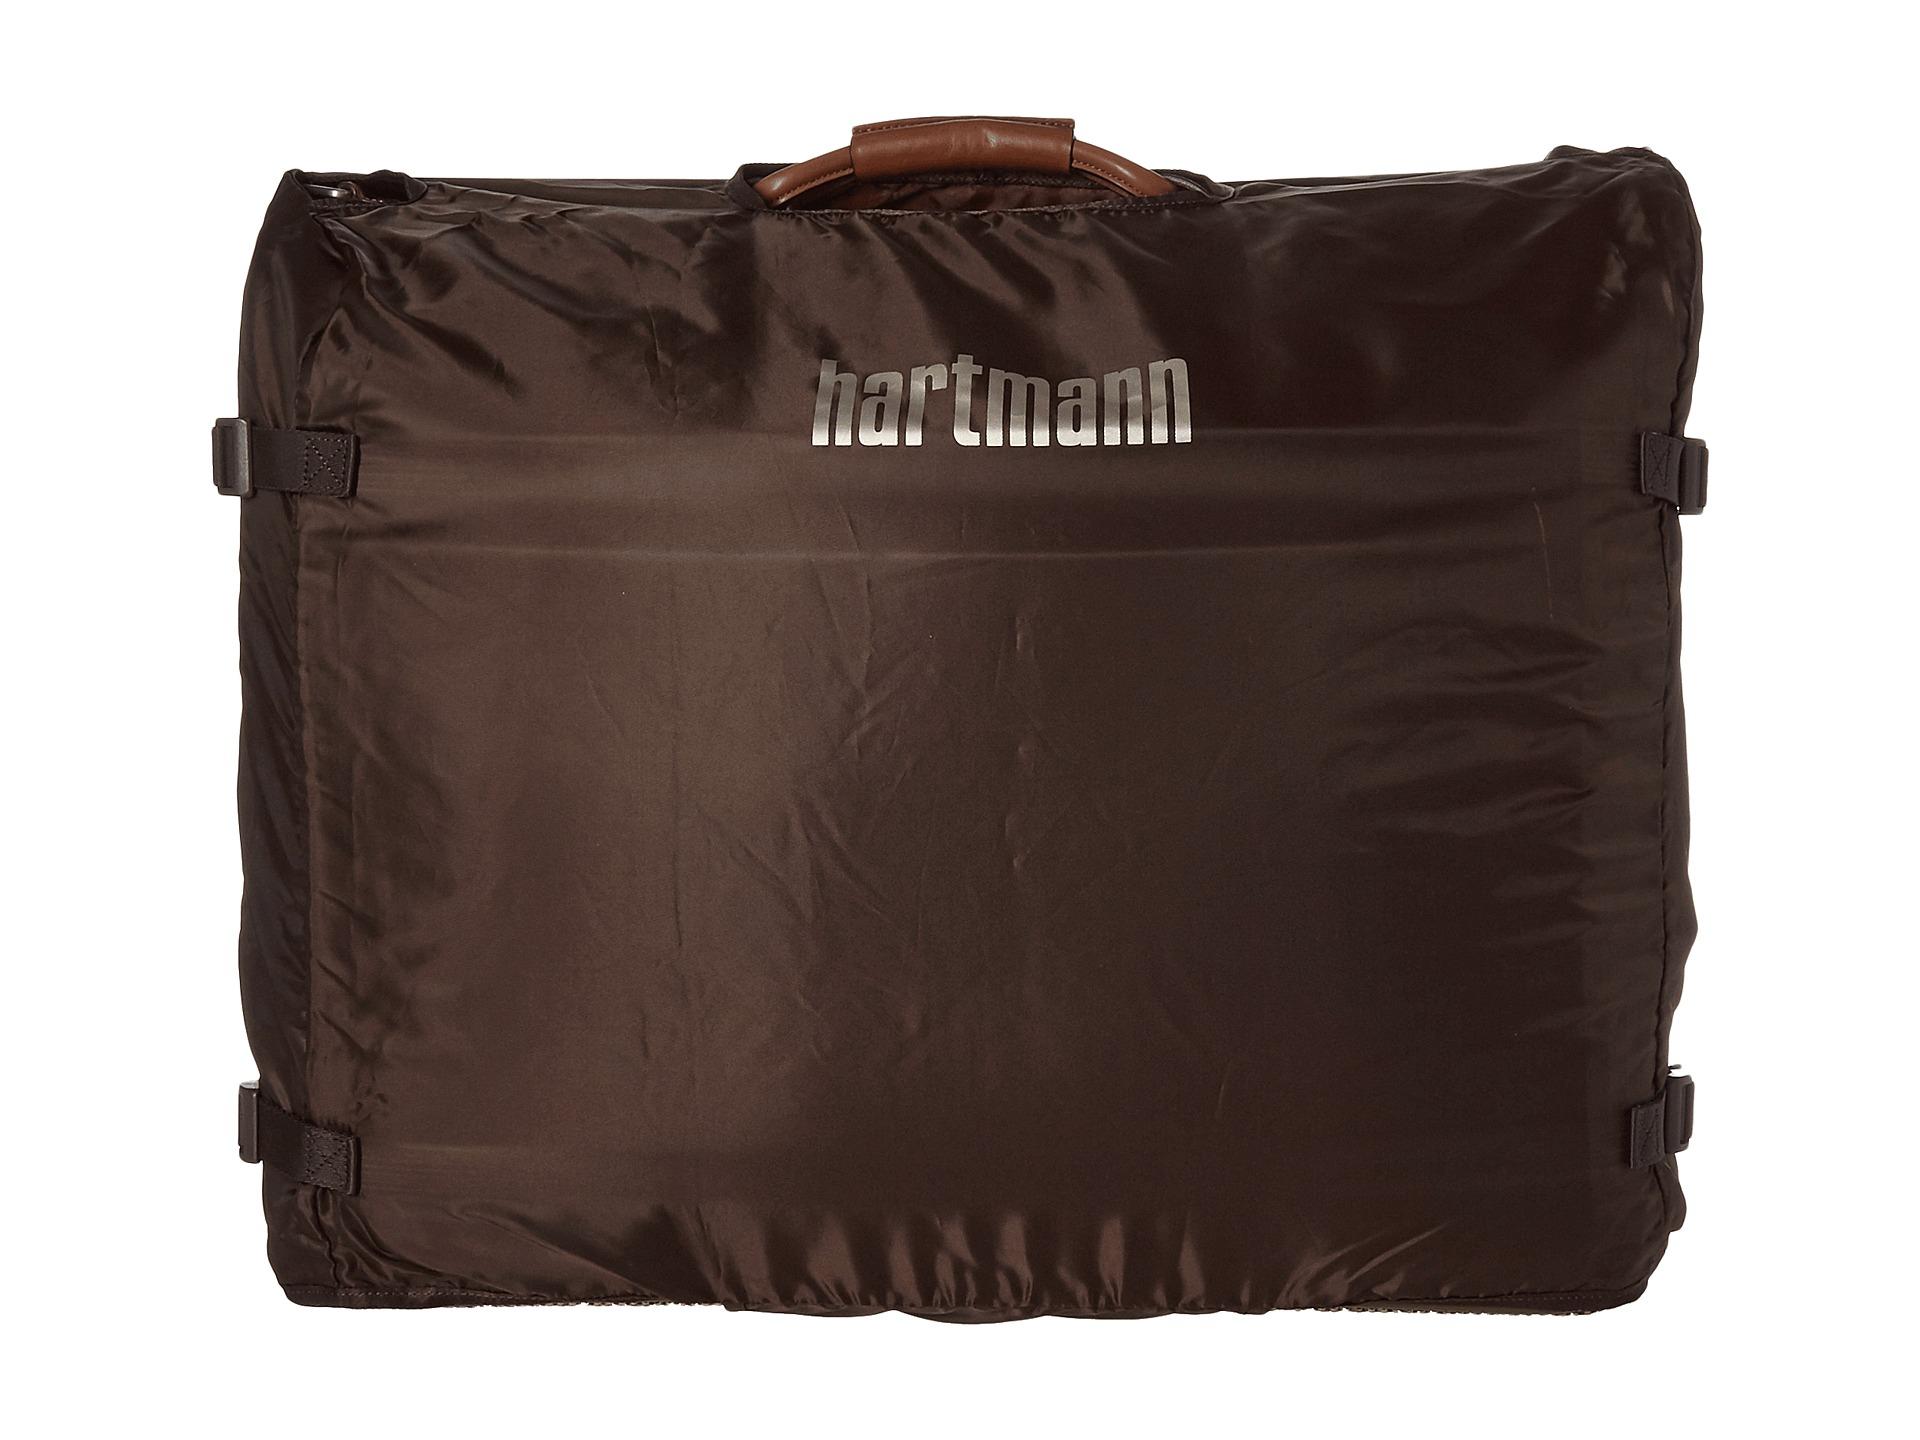 Hartmann Tweed Collection